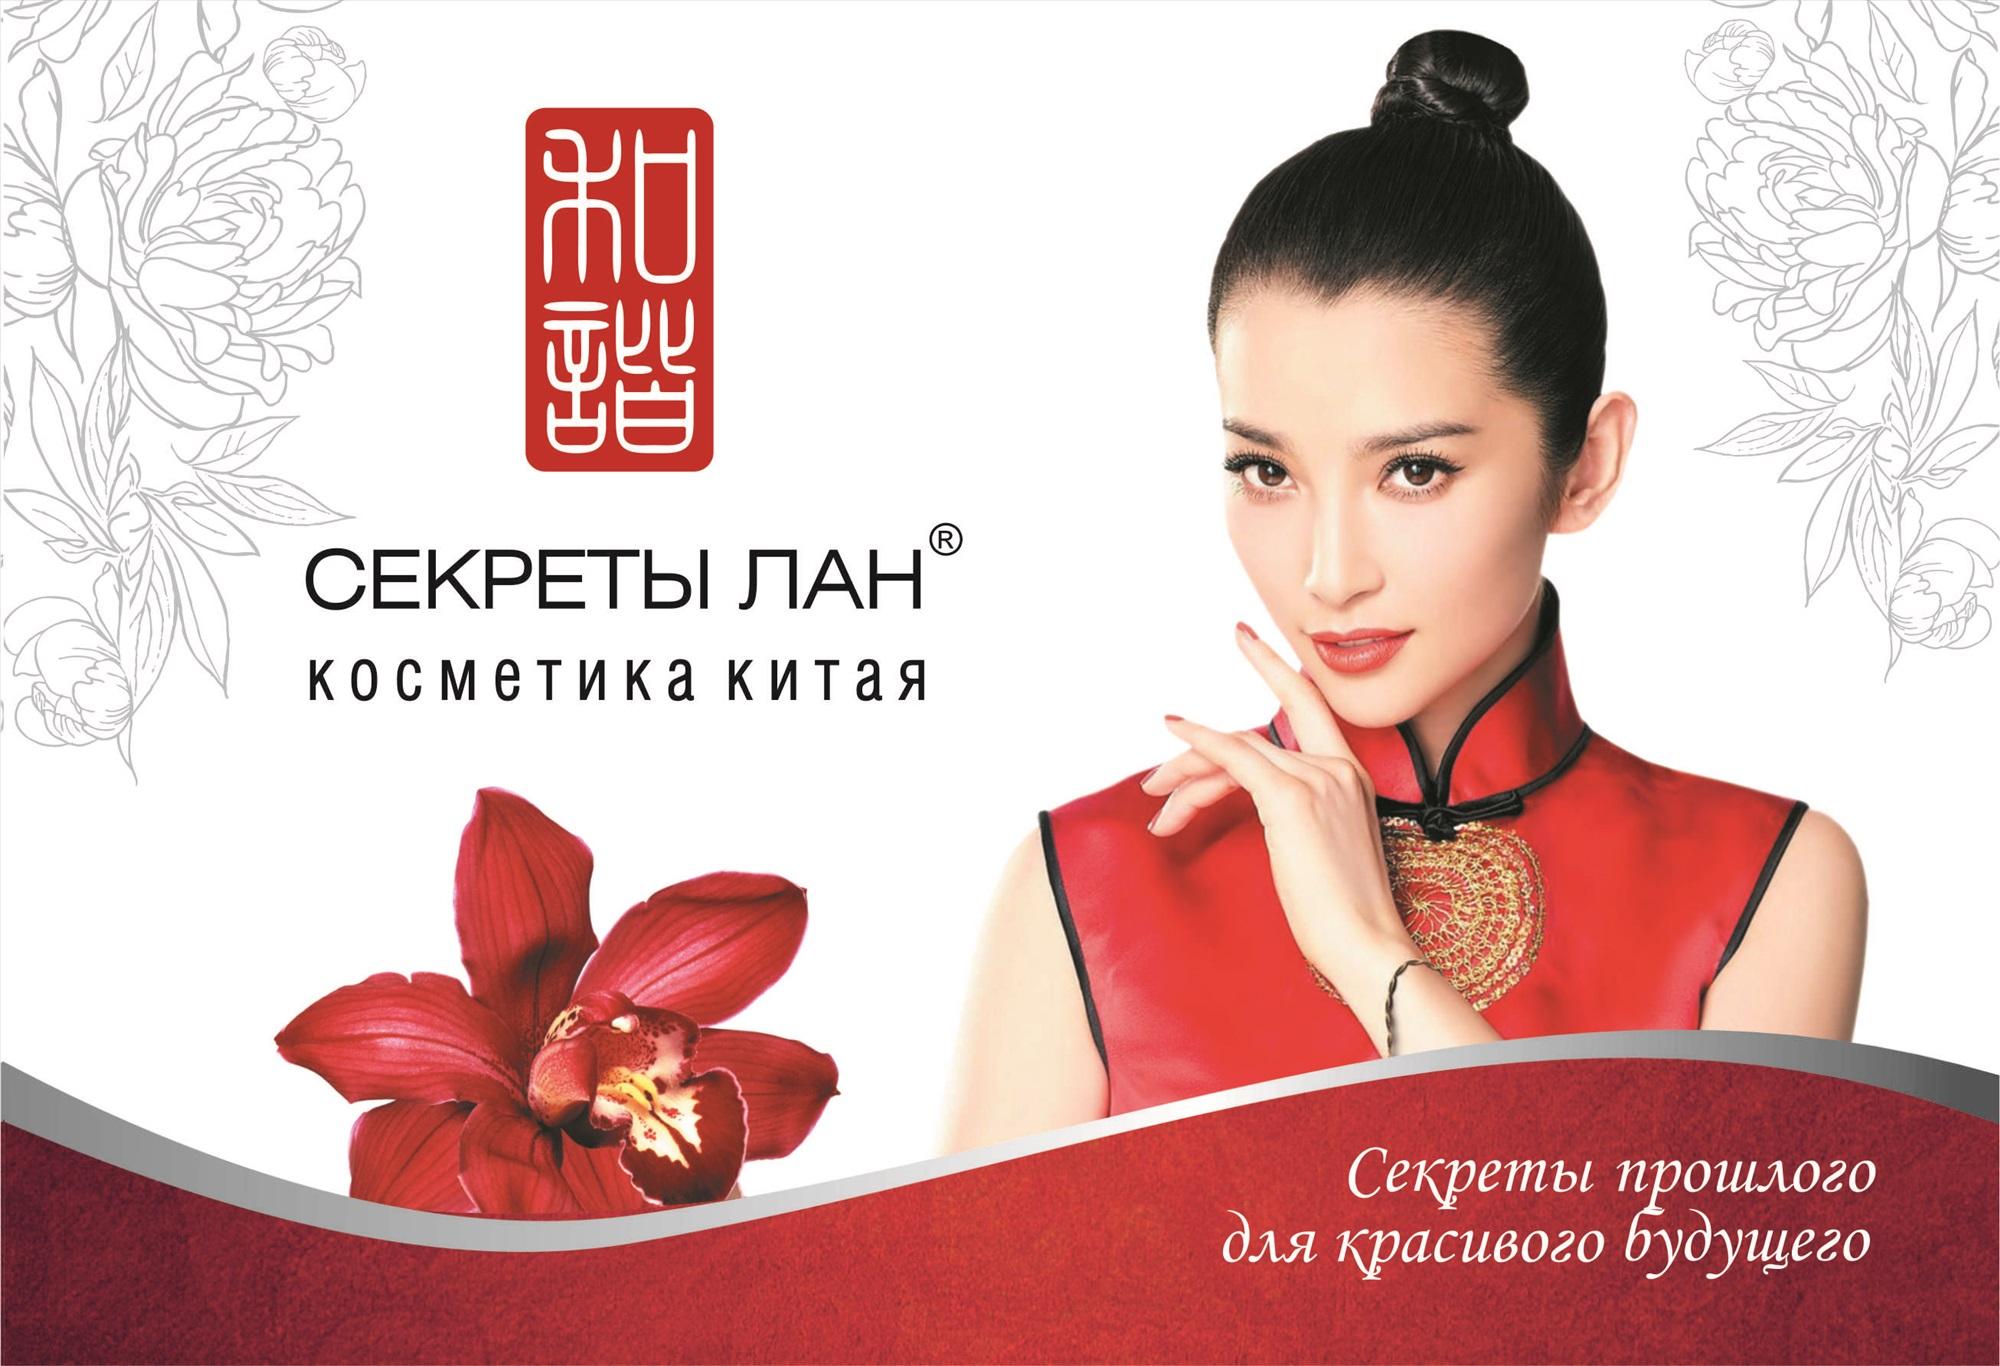 Секреты династии лан косметика купить my avon ru kupon